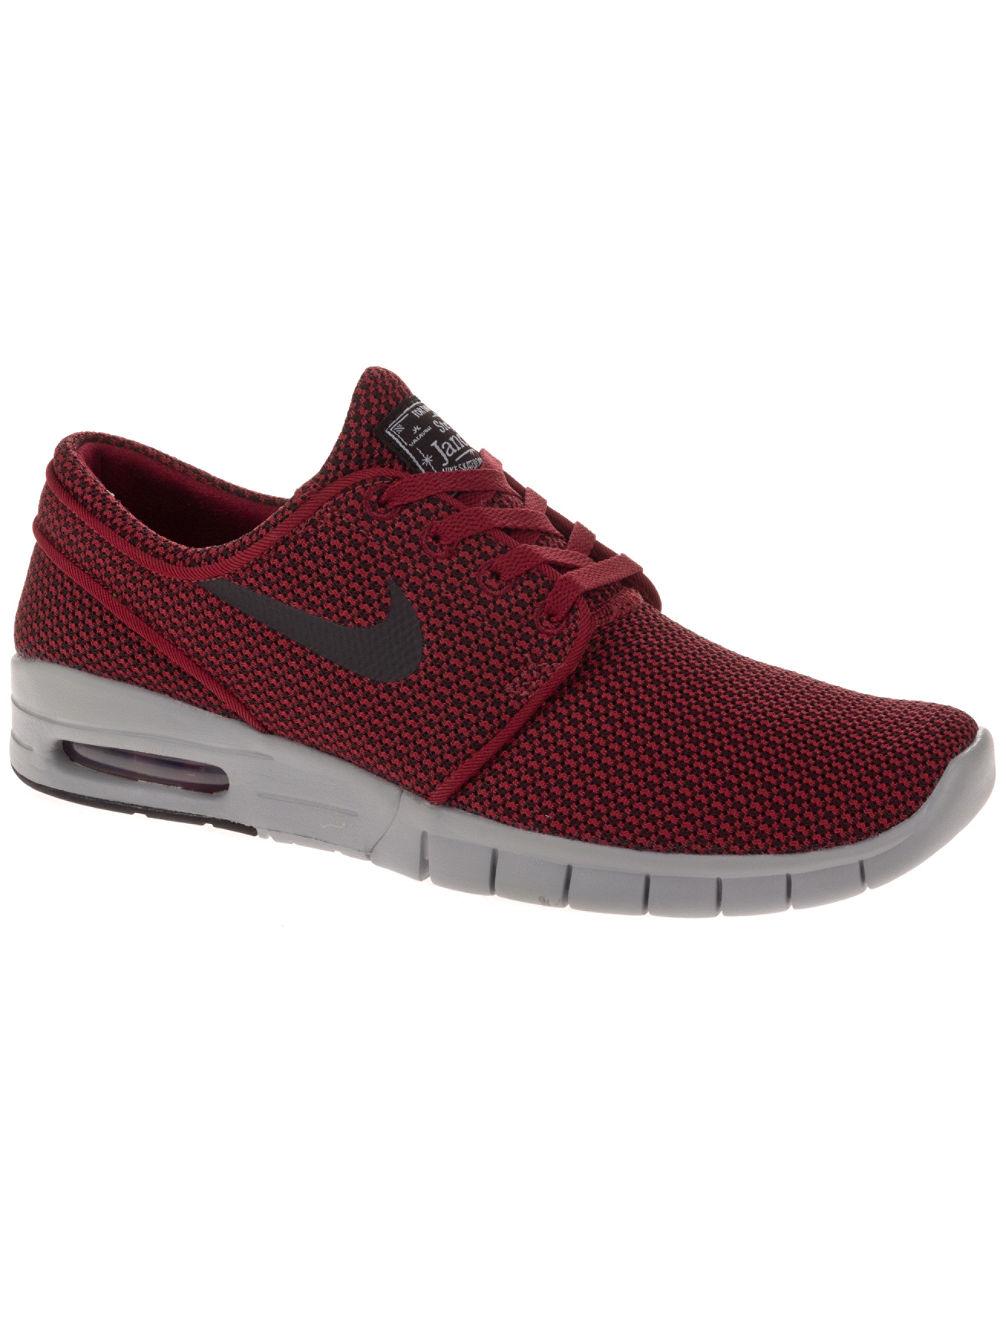 Nike Stefan Janoski Max Sneakers - nike - blue-tomato.com